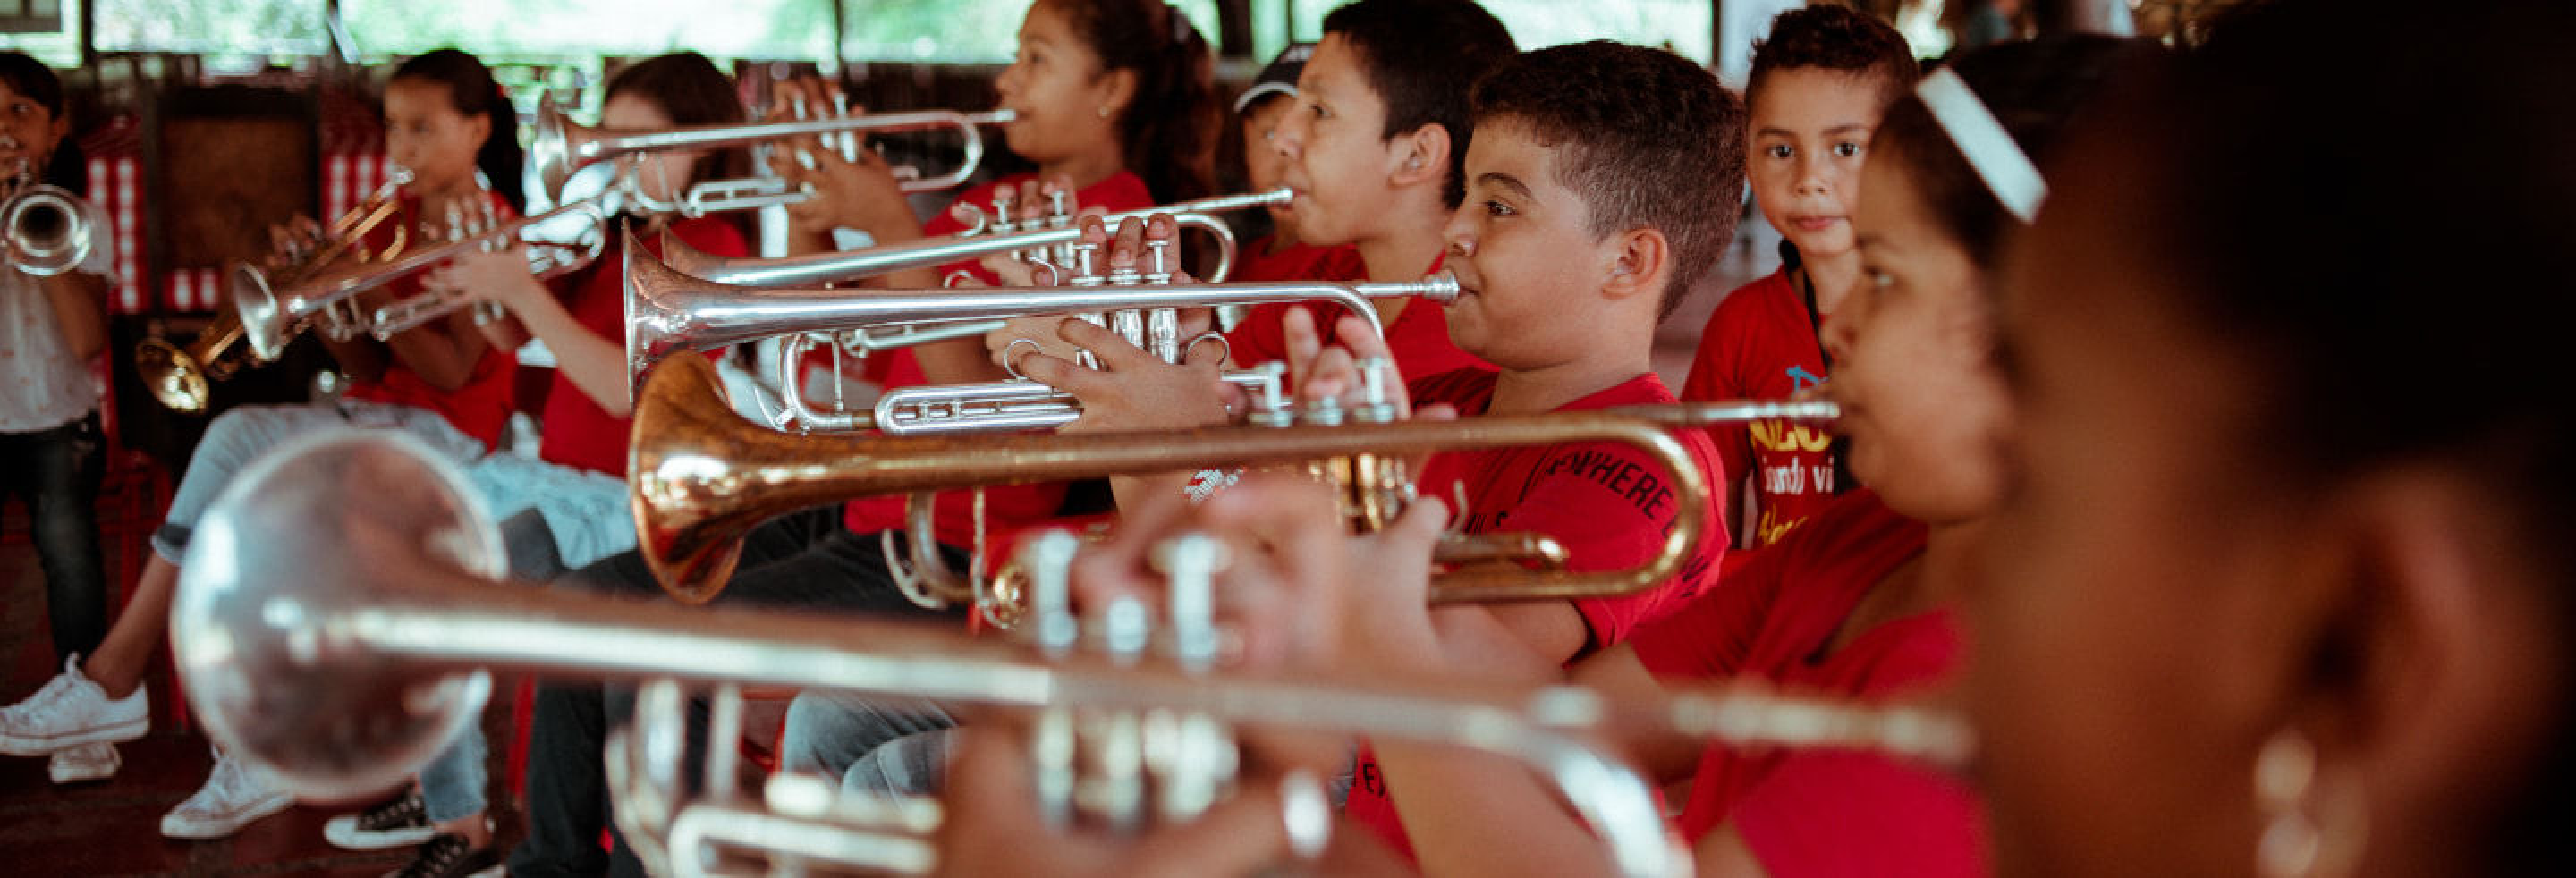 Clase de música con la Banda Baranoa